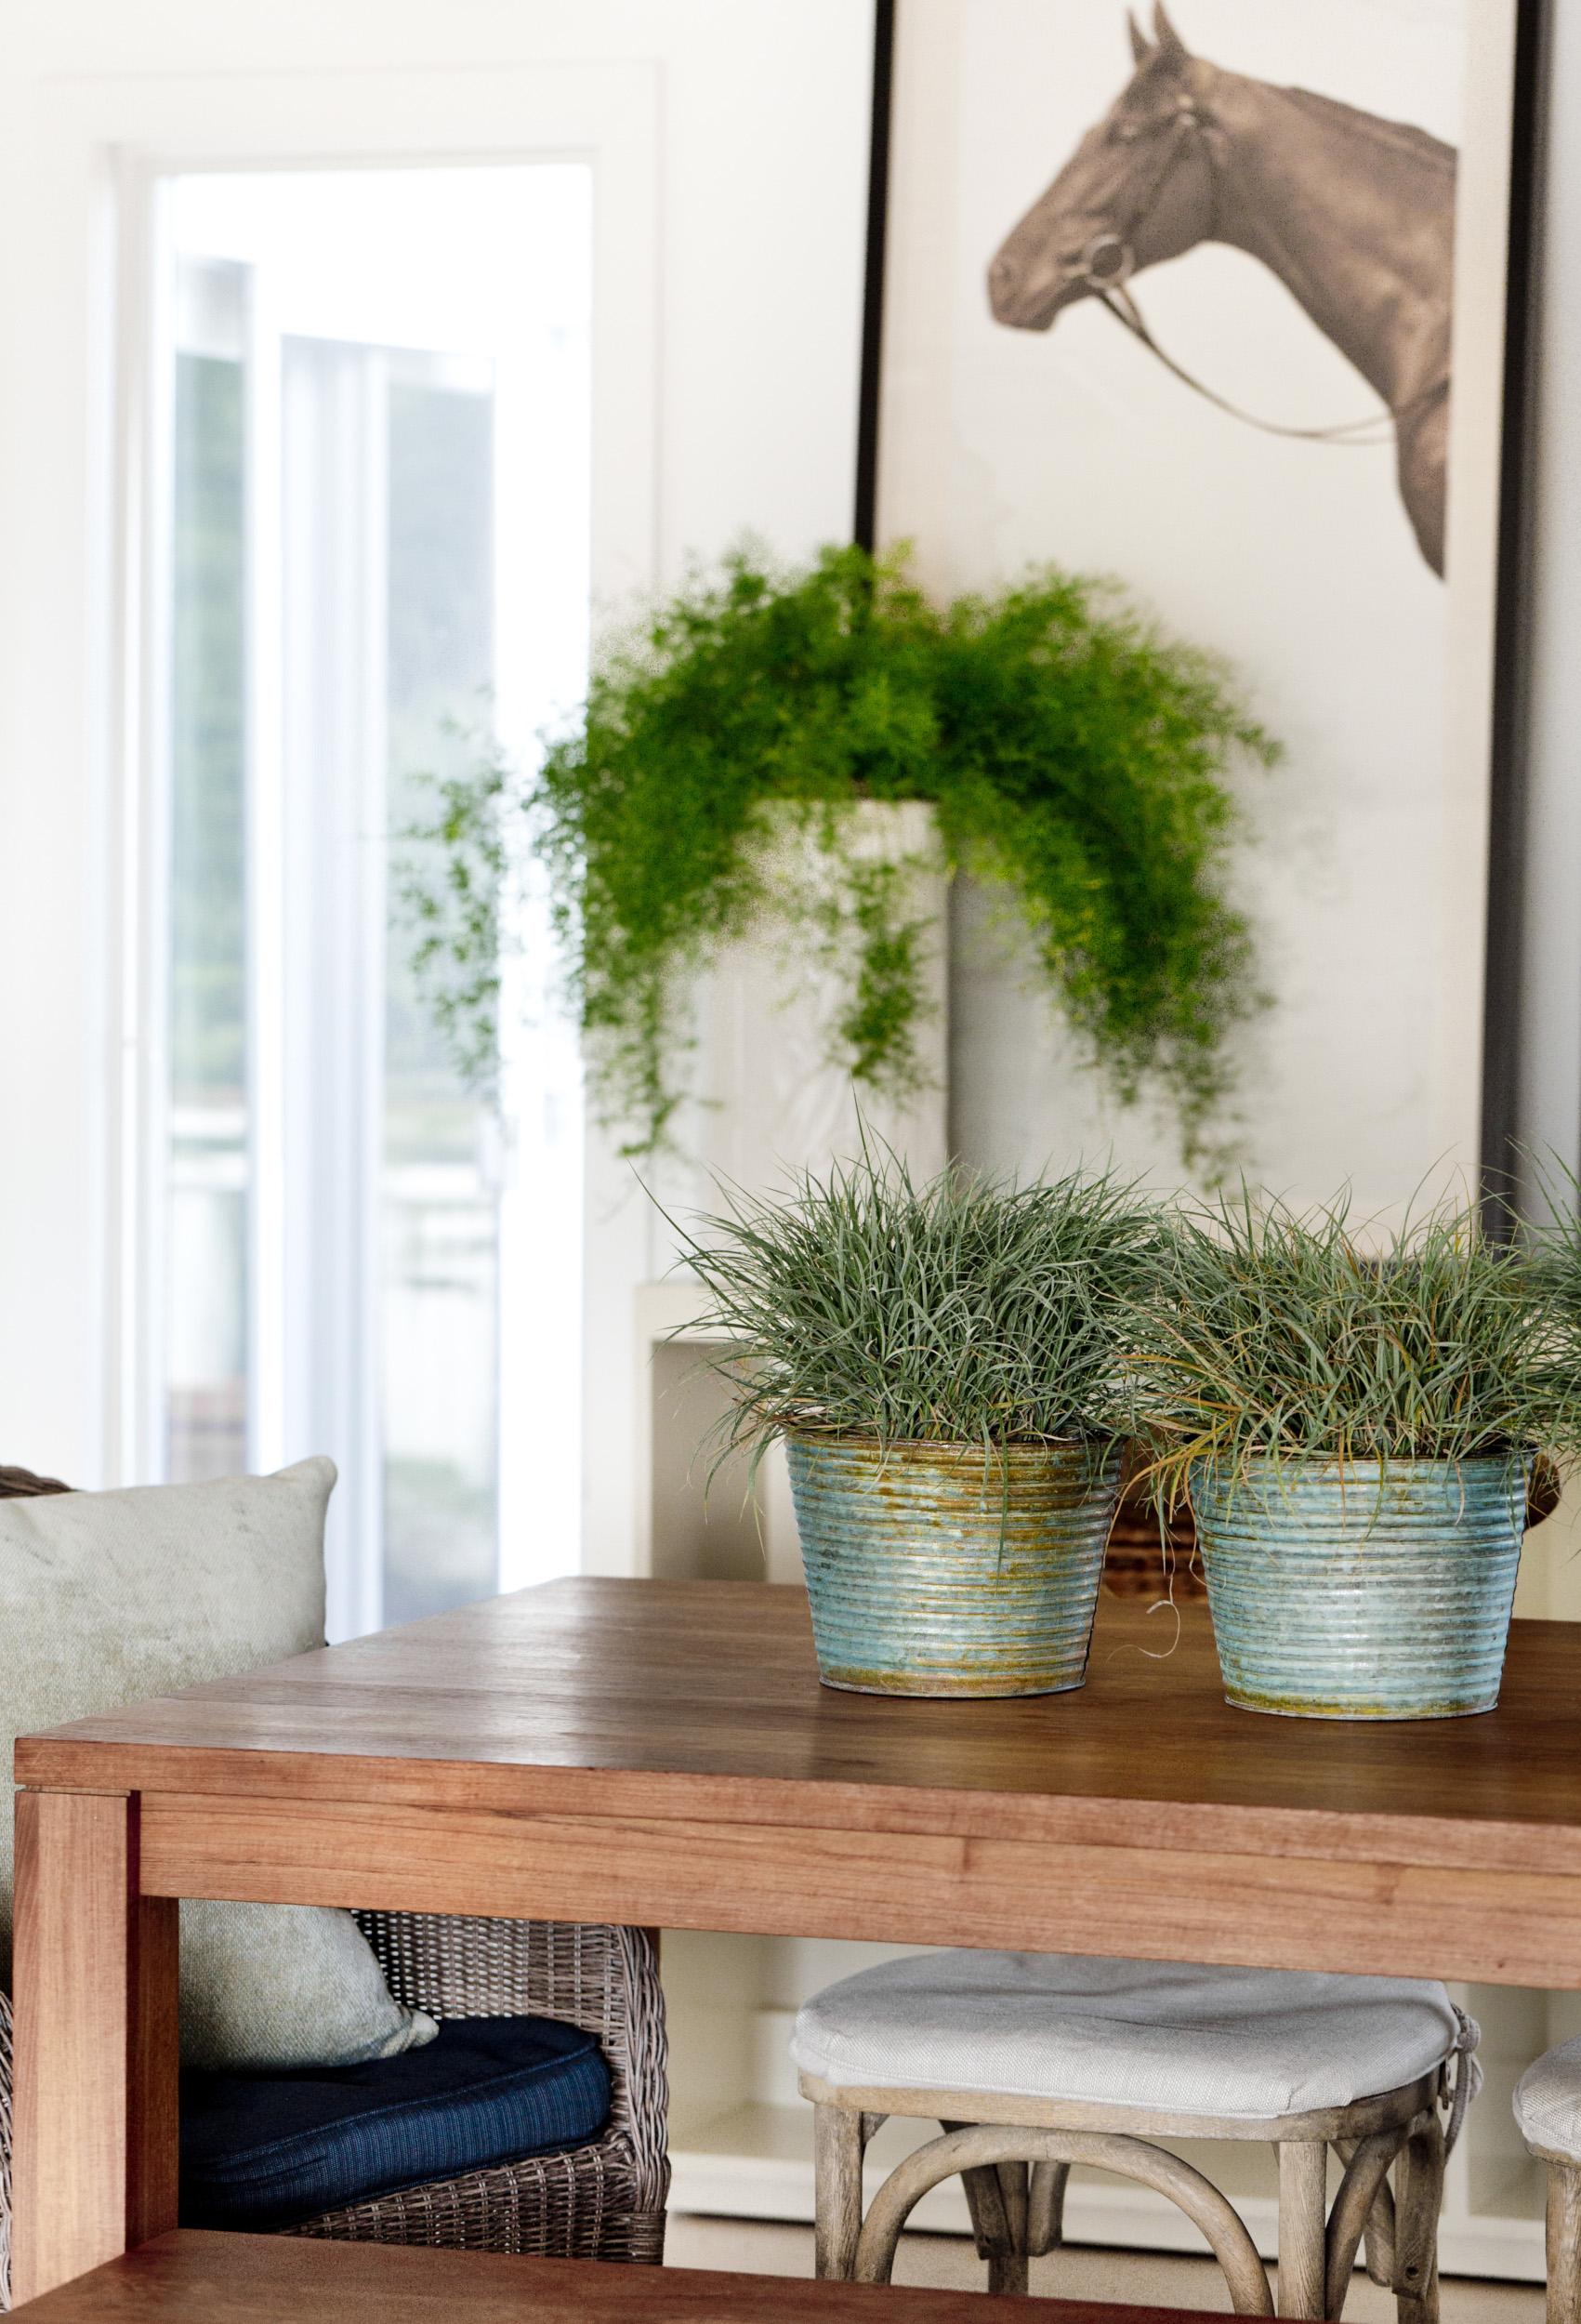 Caroline Kopp Best Interior Designers Top Interior Designers.jpg